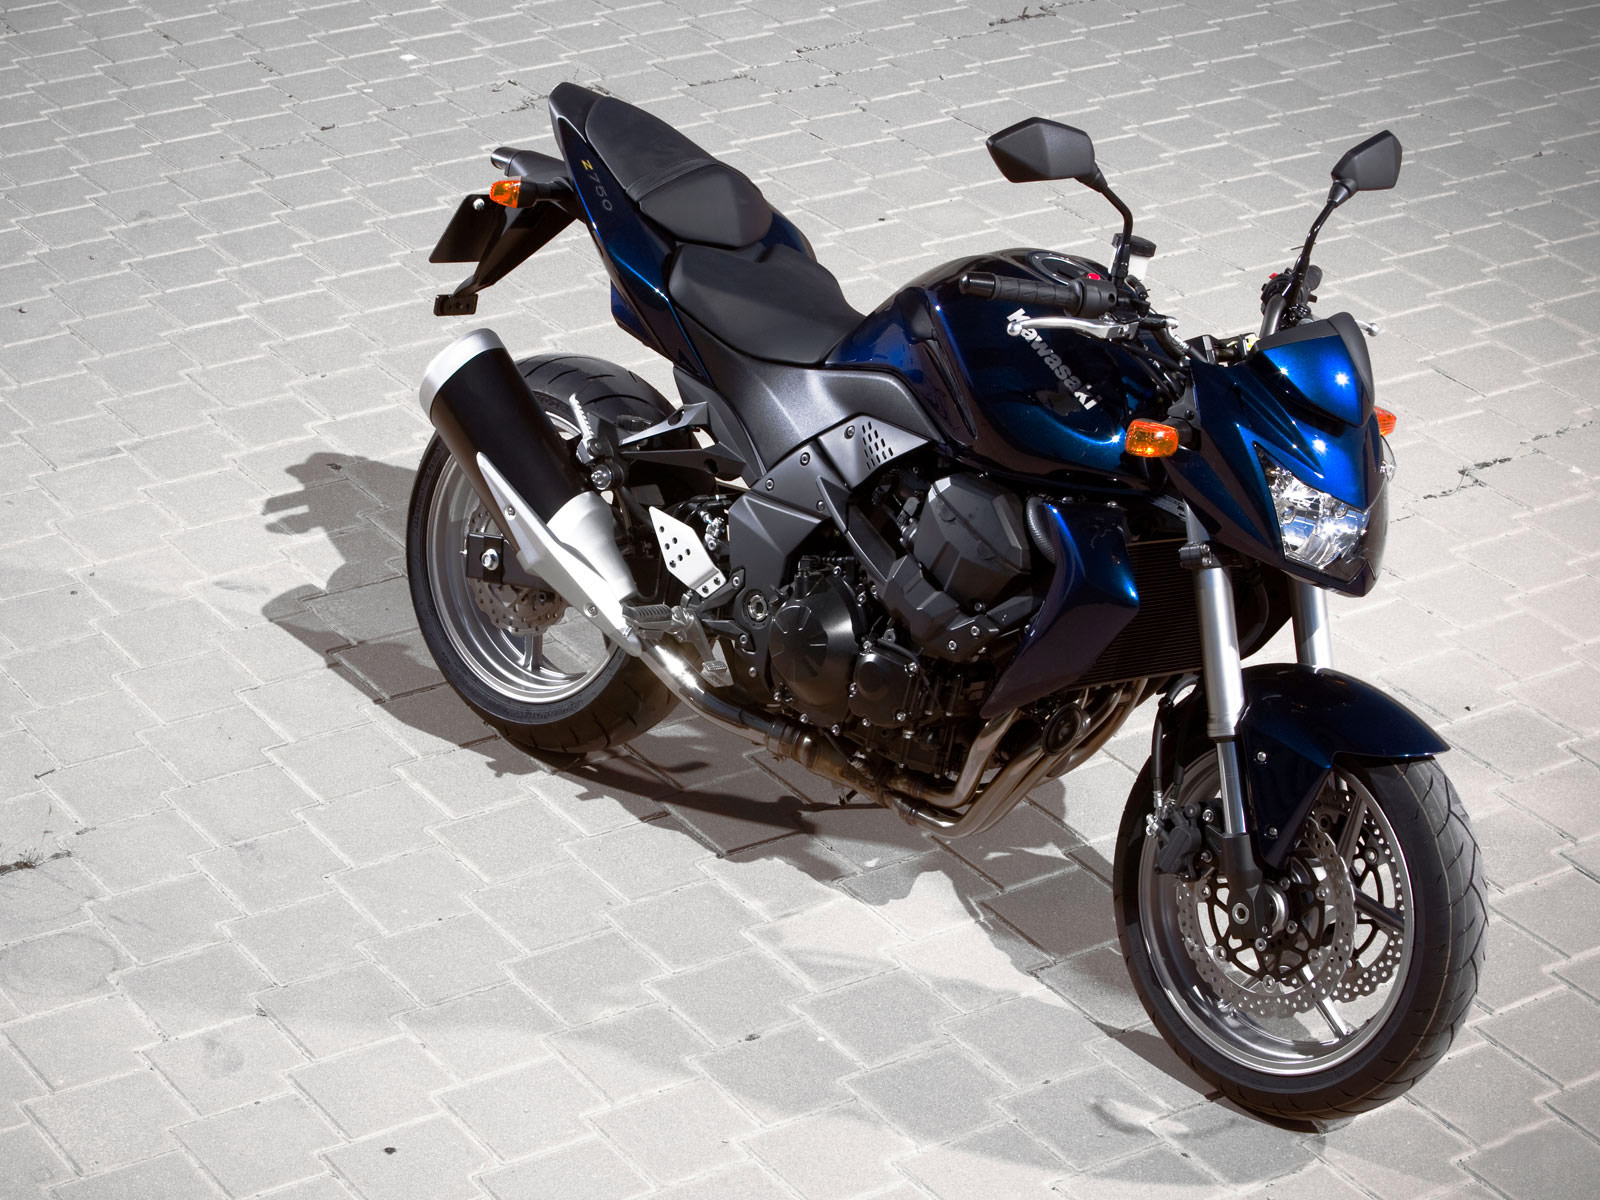 Bikes World Kawasaki Z 750 Wallpapers